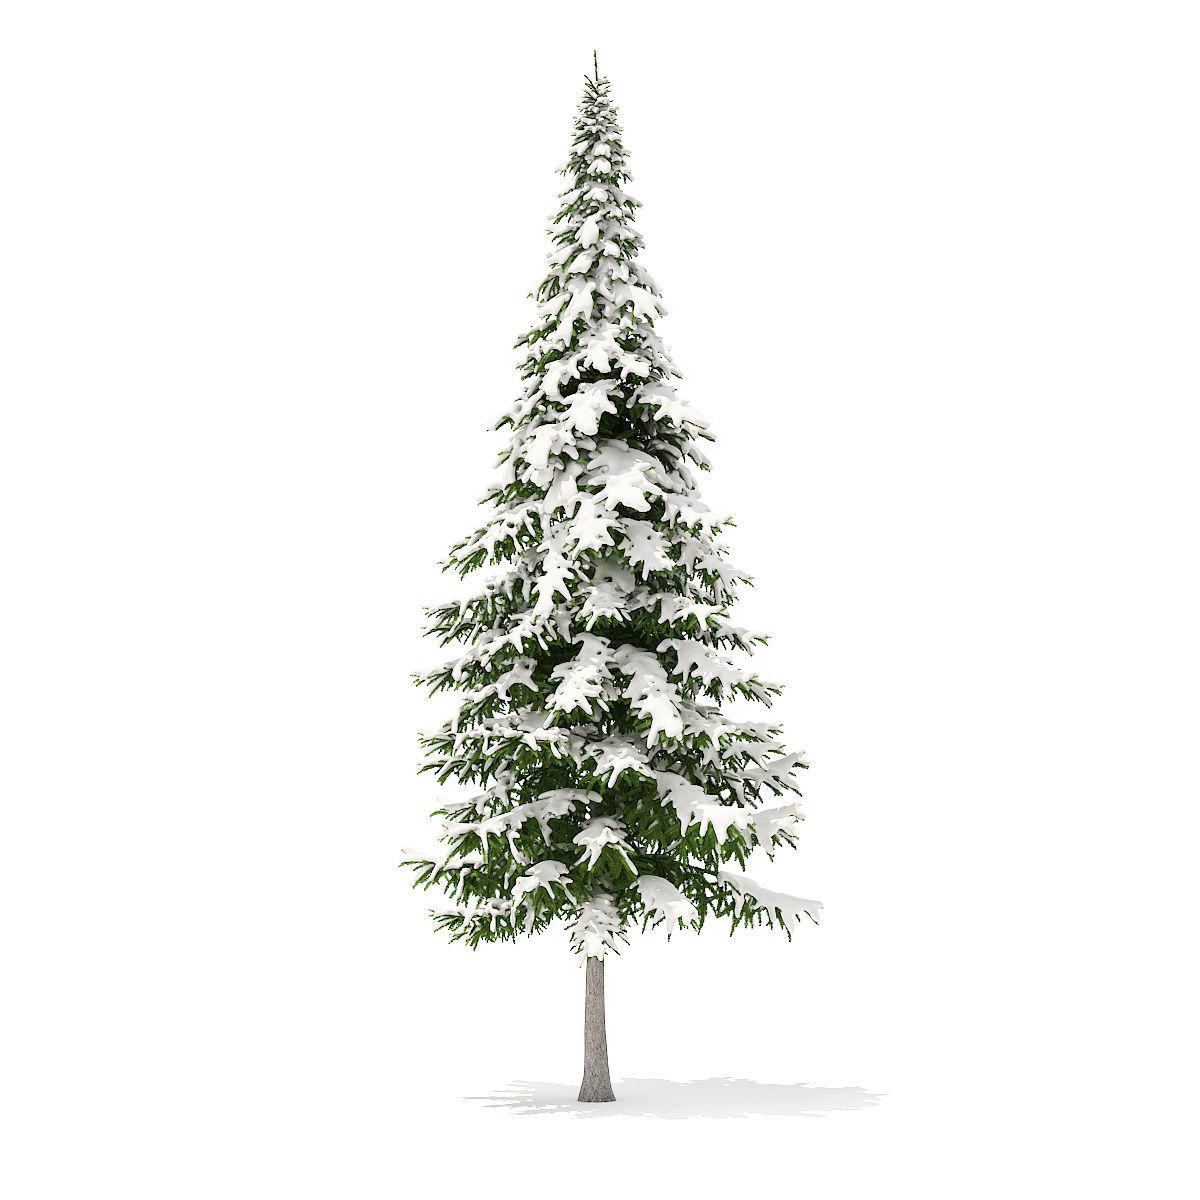 Fir Tree with Snow 10m